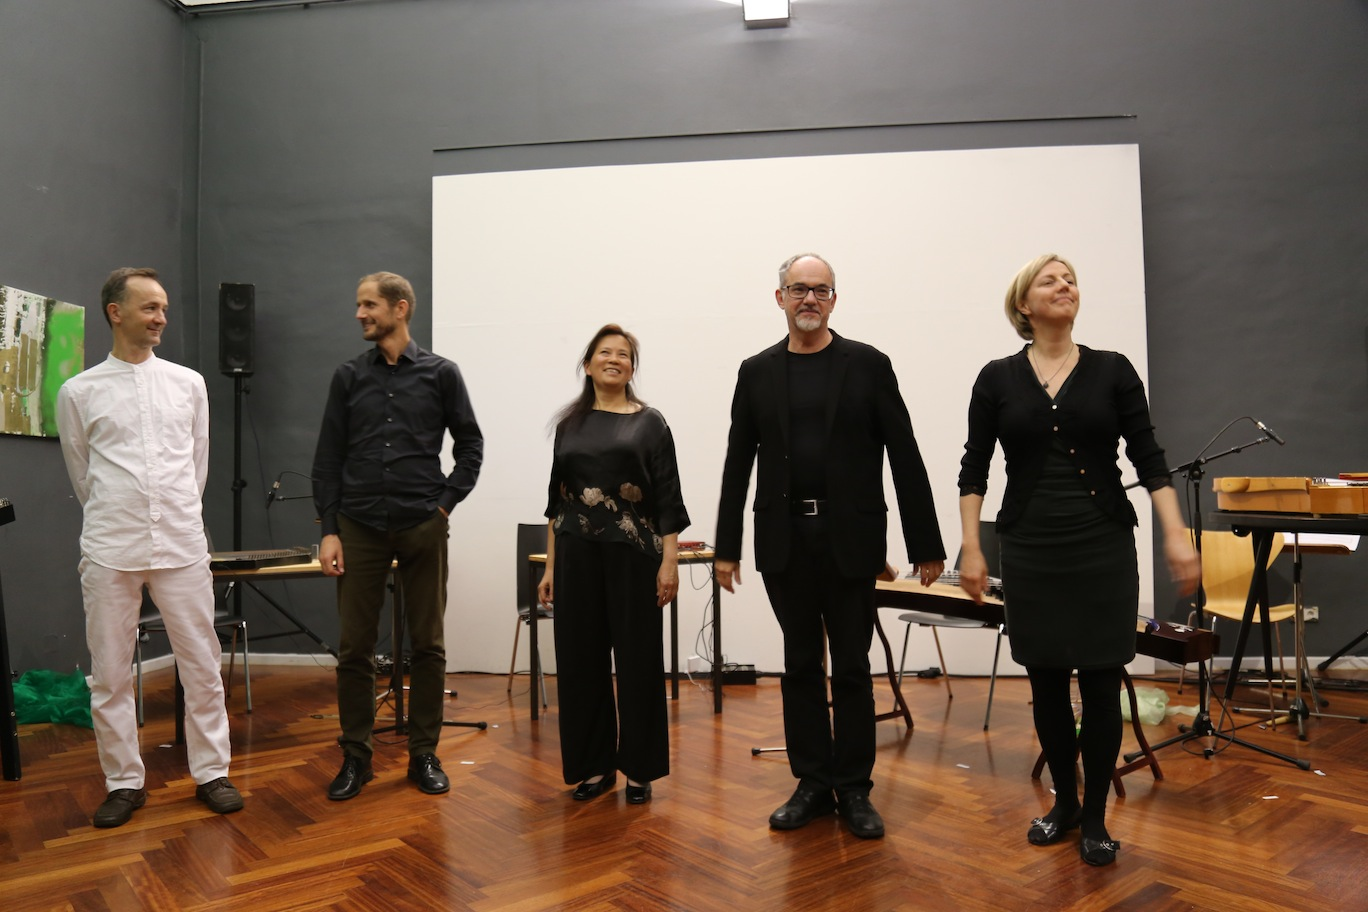 Mikko Raasakka, Martin Mallaun, Ming Wang, Karlheinz Essl, Eija Kankaanranta